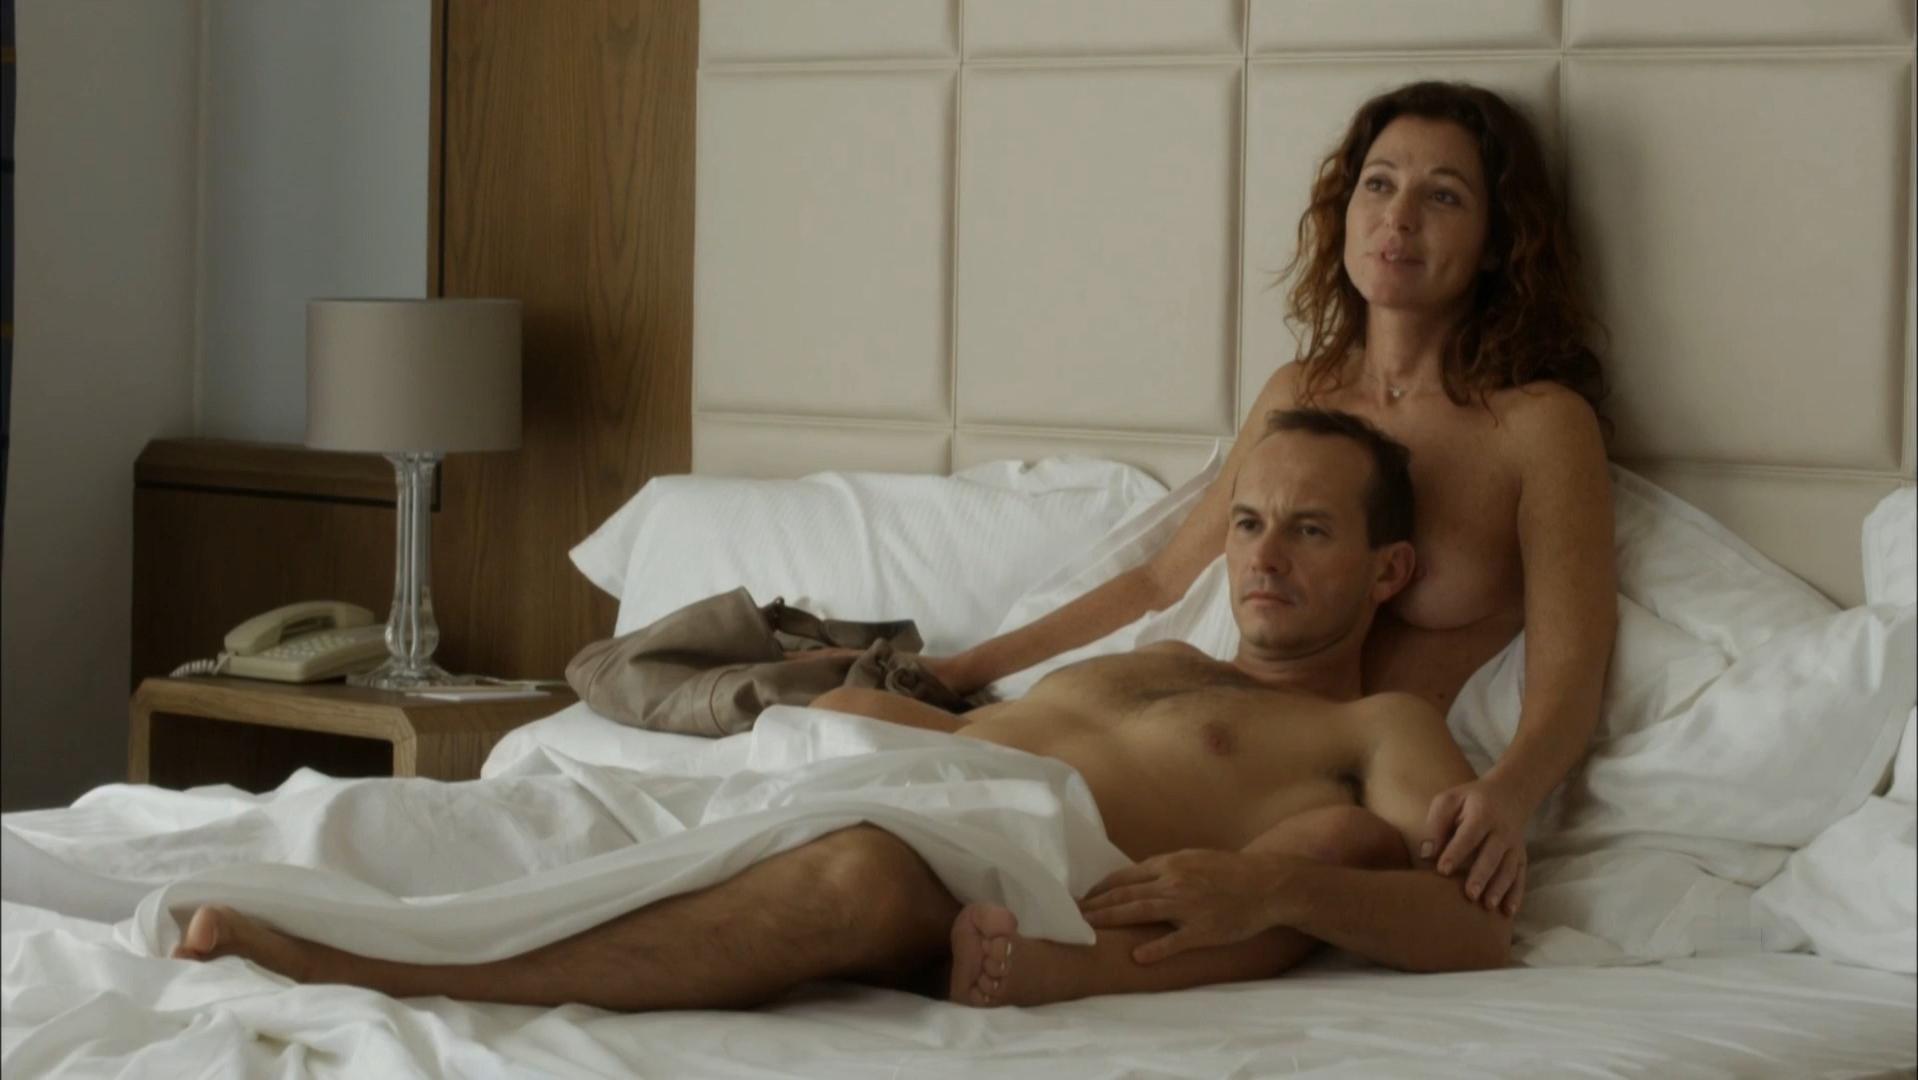 Valerie Decobert-Koretzky nude - Les Dames s01e07 (2014)